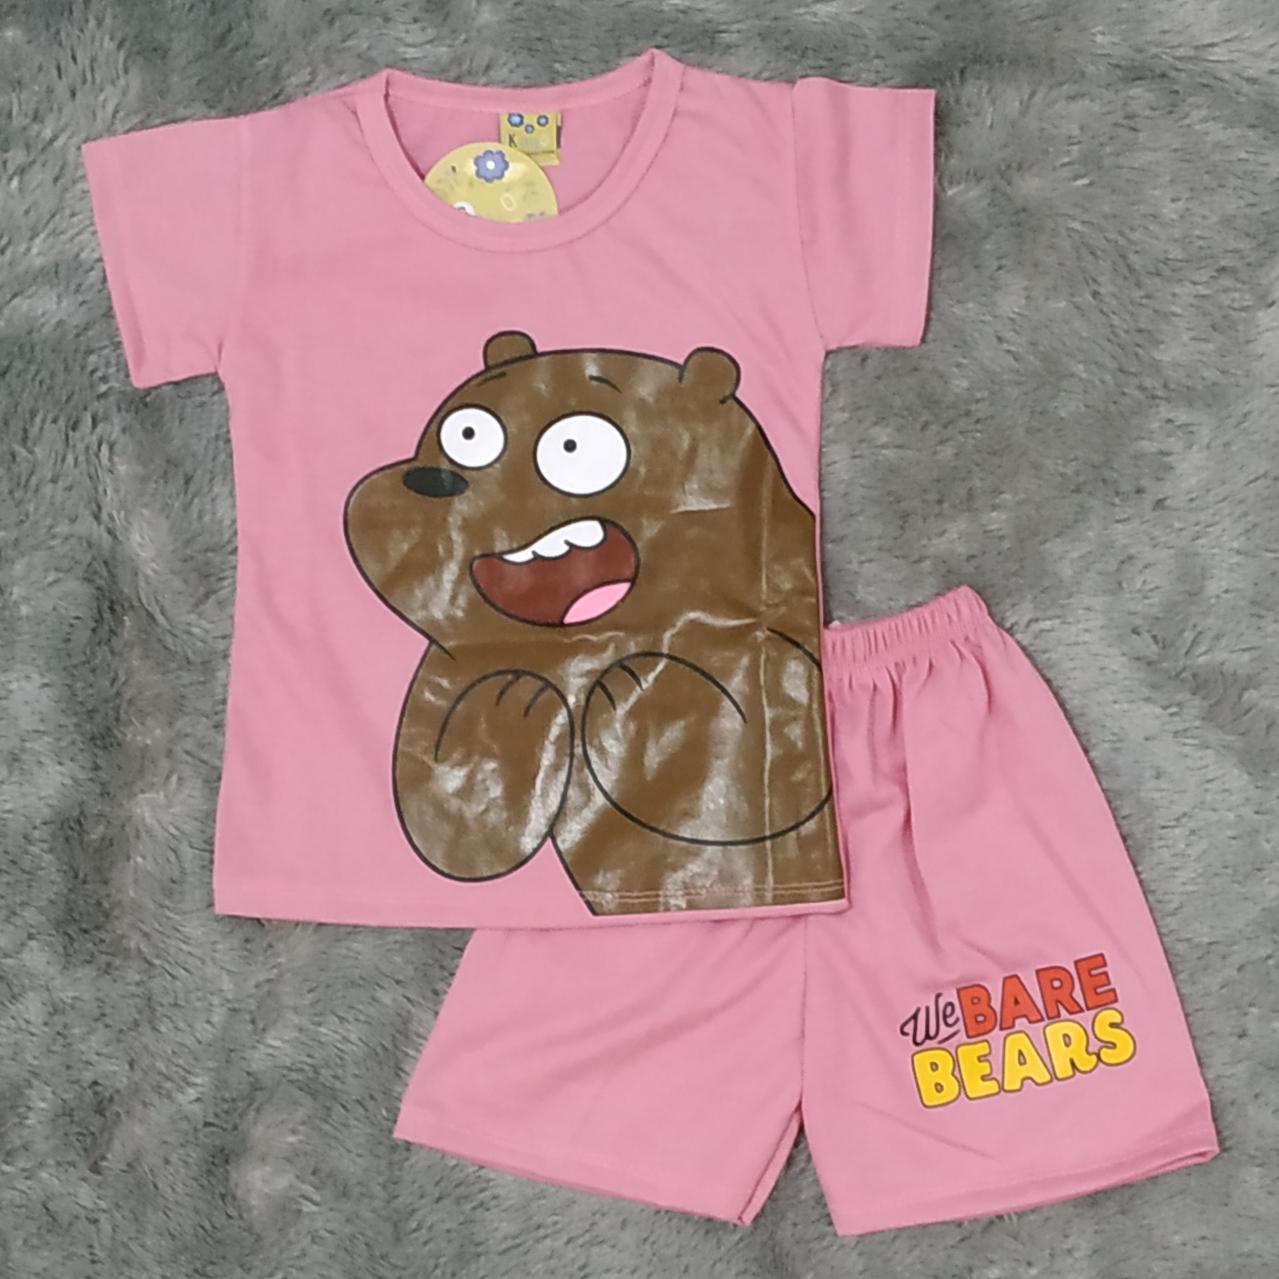 cod setelan anak anak we bare bear grizzly size s m l xl umur 0-4 tahun